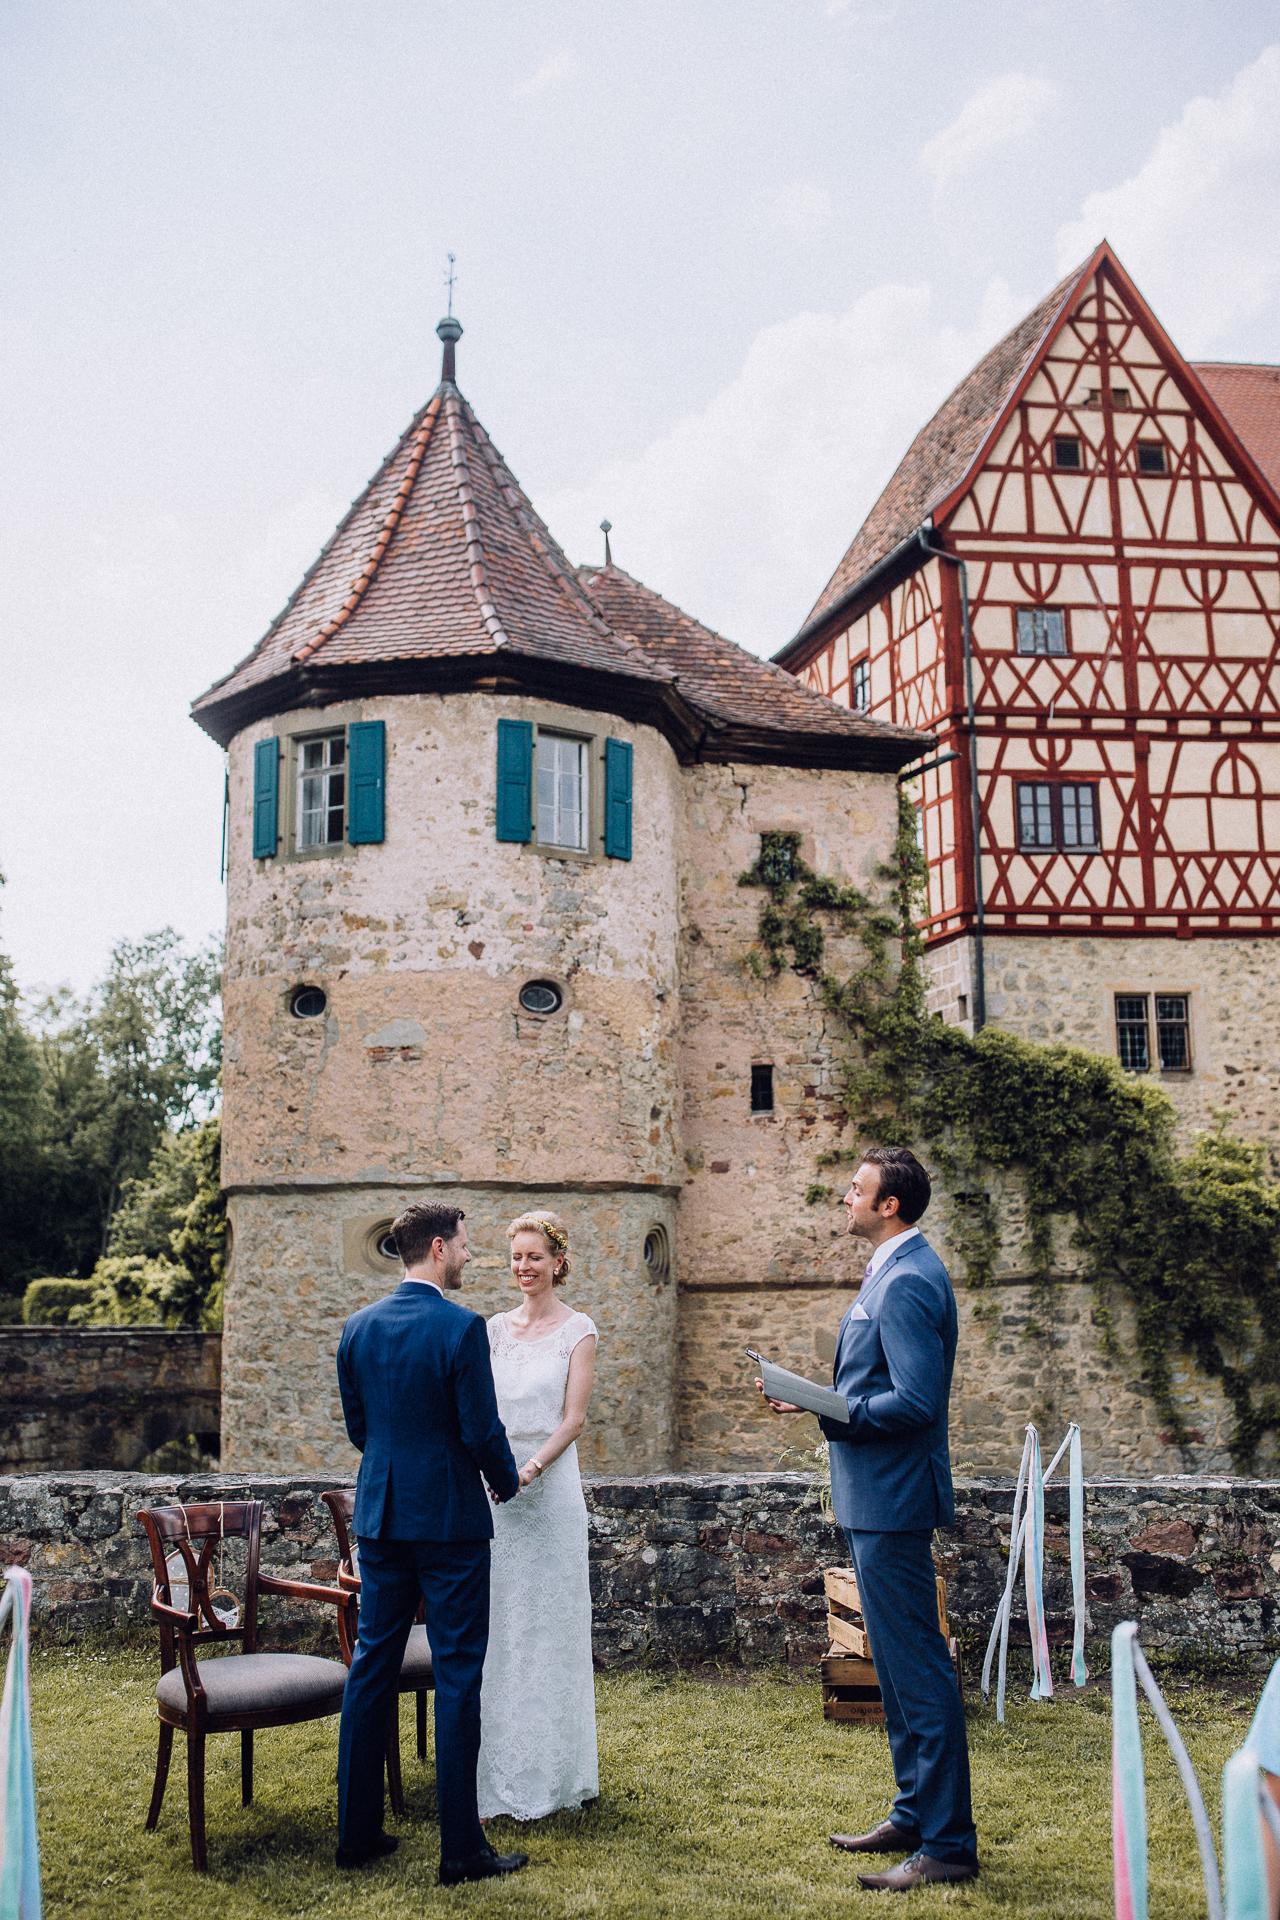 Freie Trauung M & P (Photos by www.chrisandruth.com)